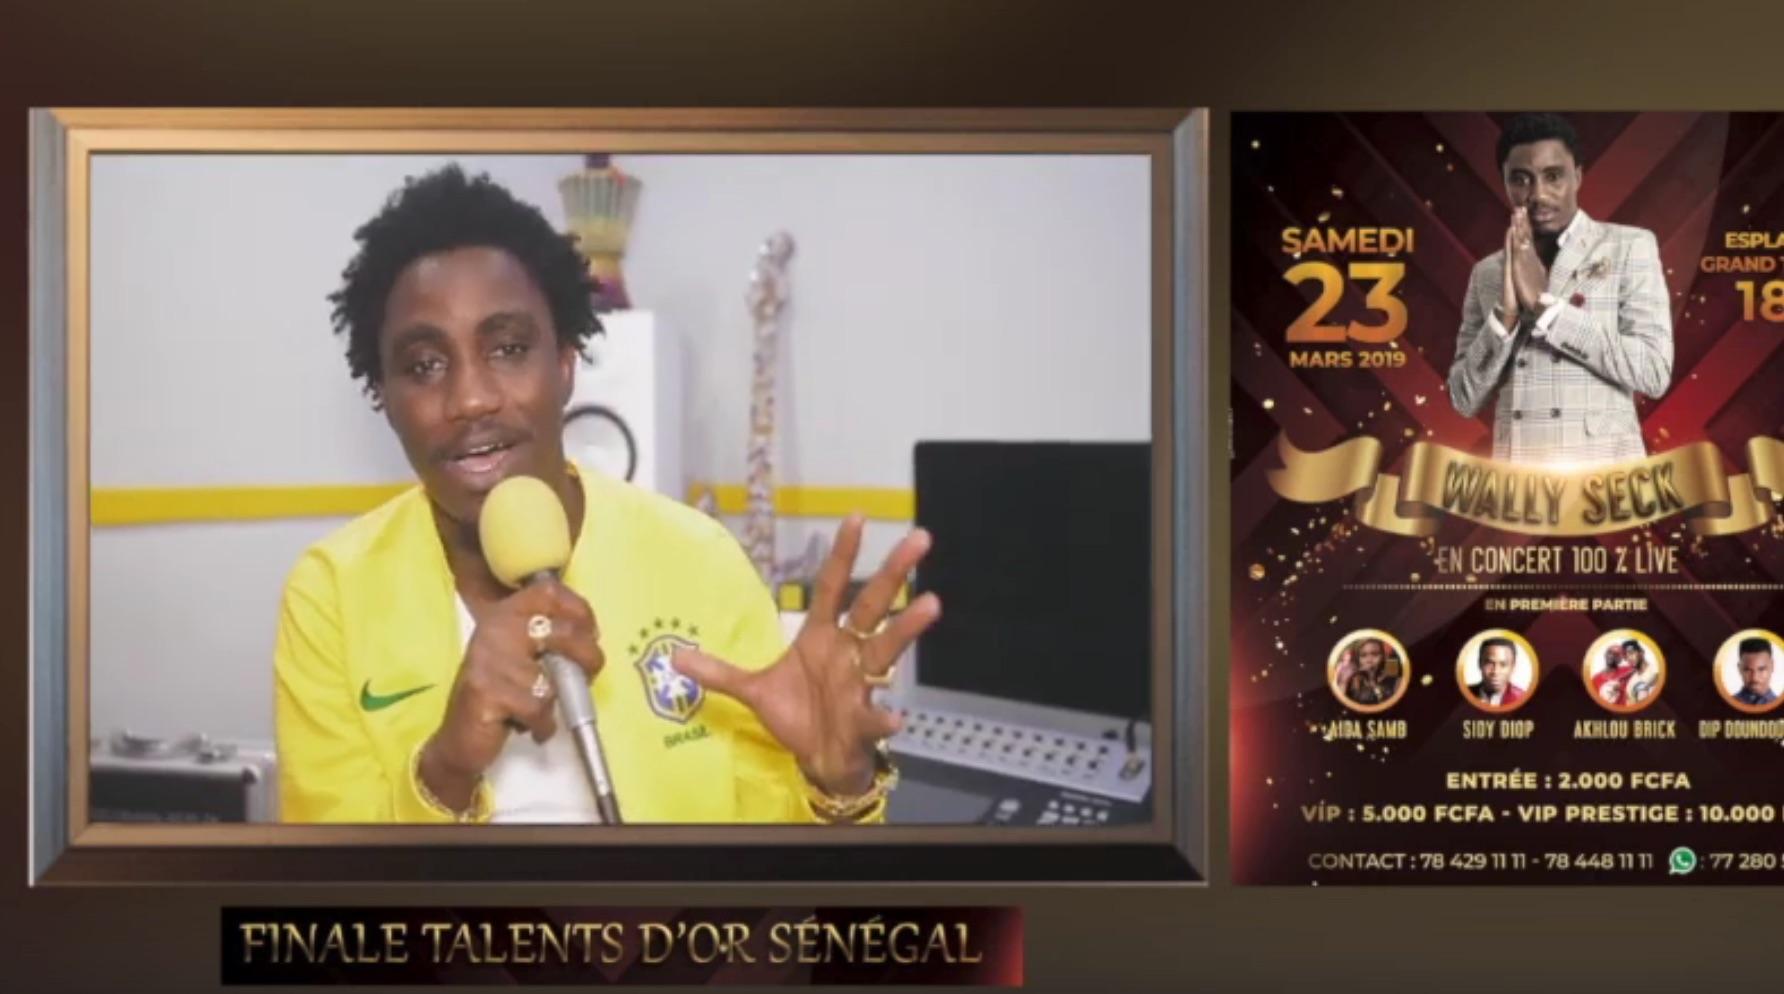 finale musique, Talents D'or, Wally seck